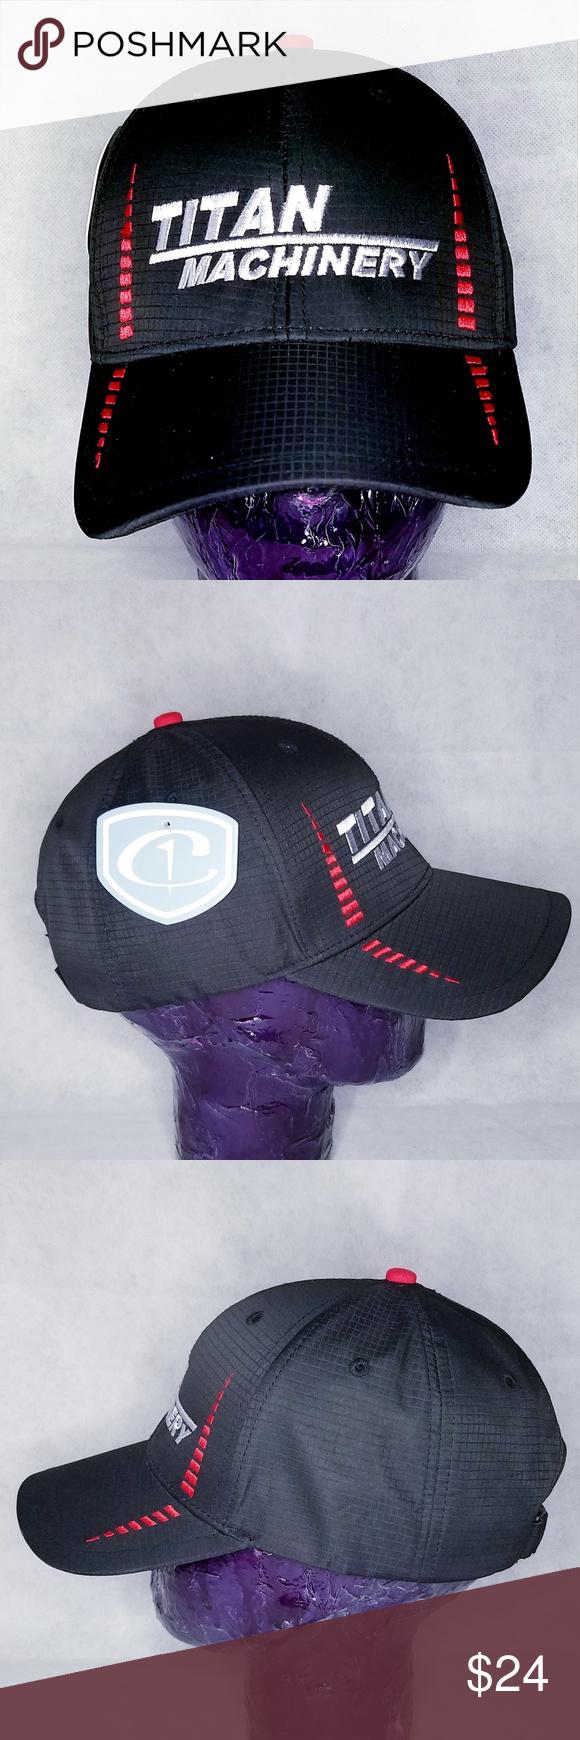 Titan Machinery Hat Baseball Cap Moisture Wicking Baseball Hats Baseball Cap Hats